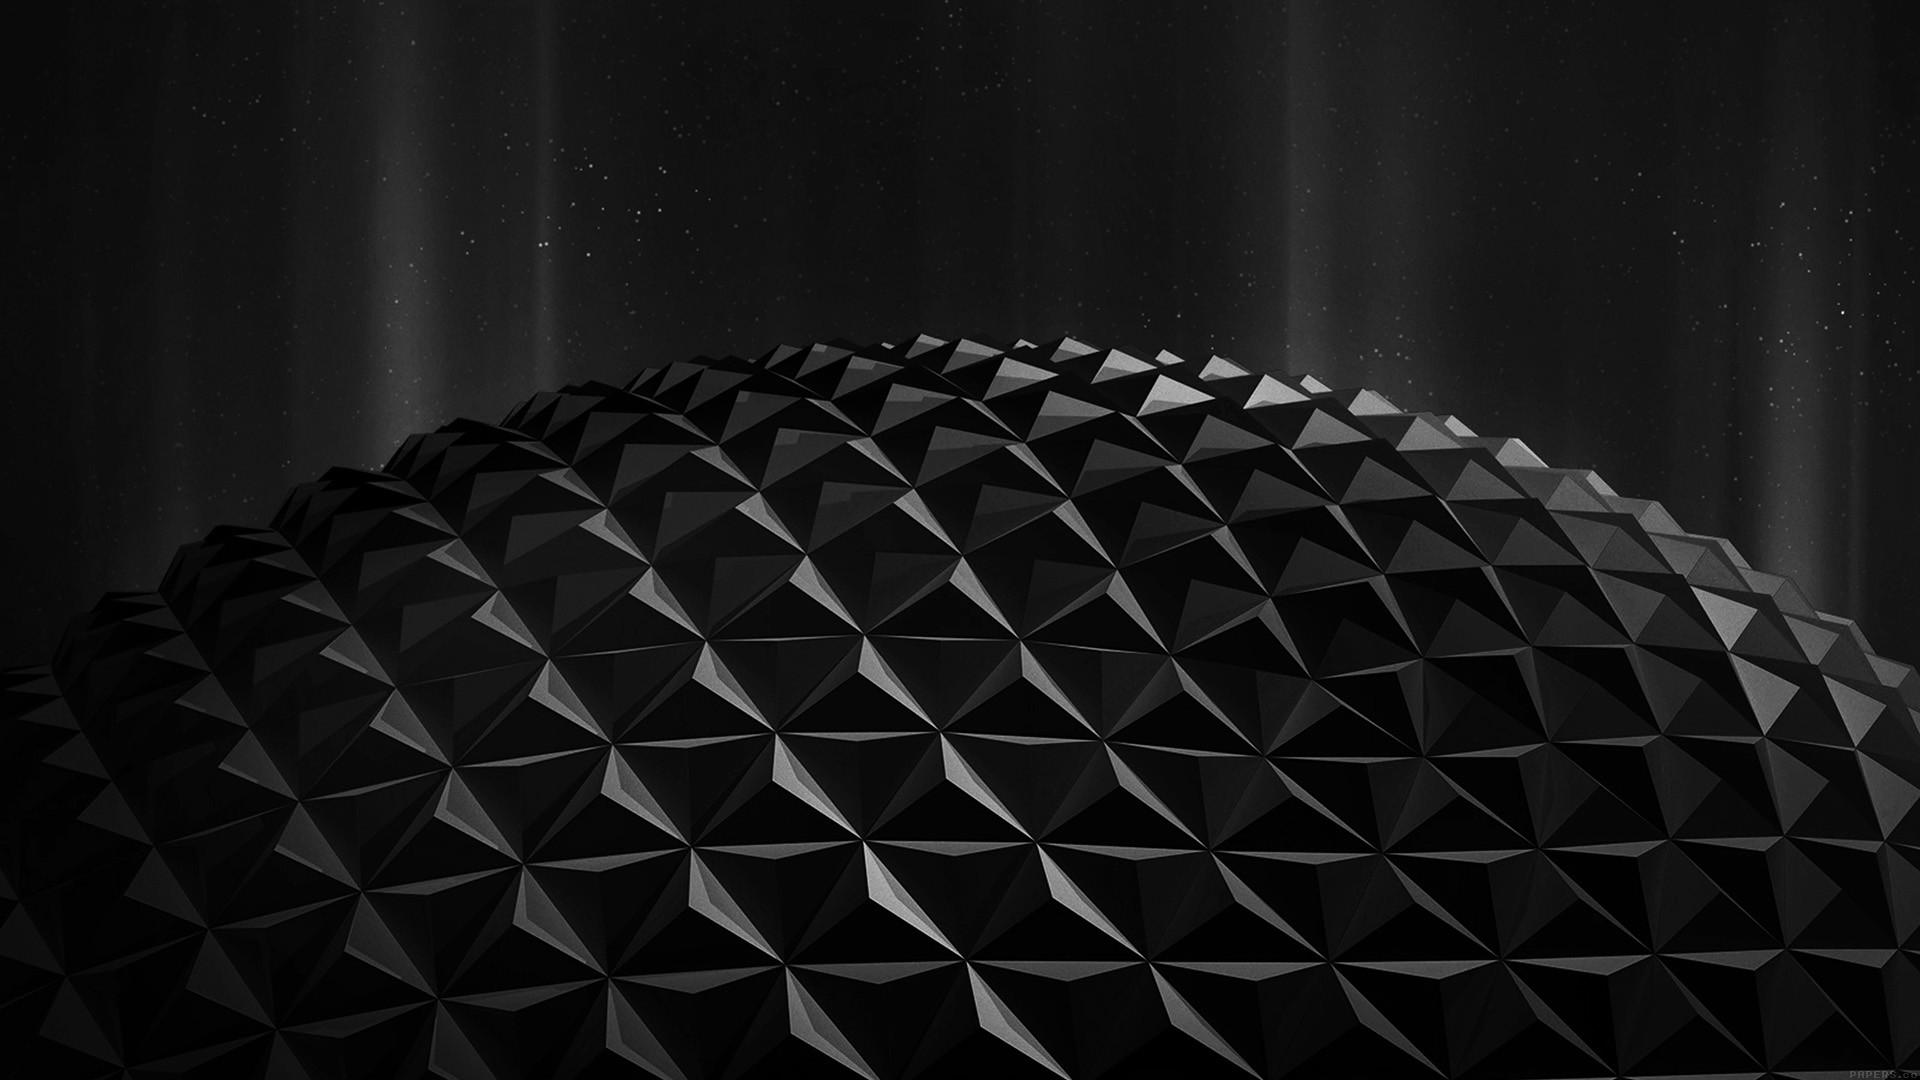 Wallpaper Digital Art Night Abstract 3d Minimalism Sphere